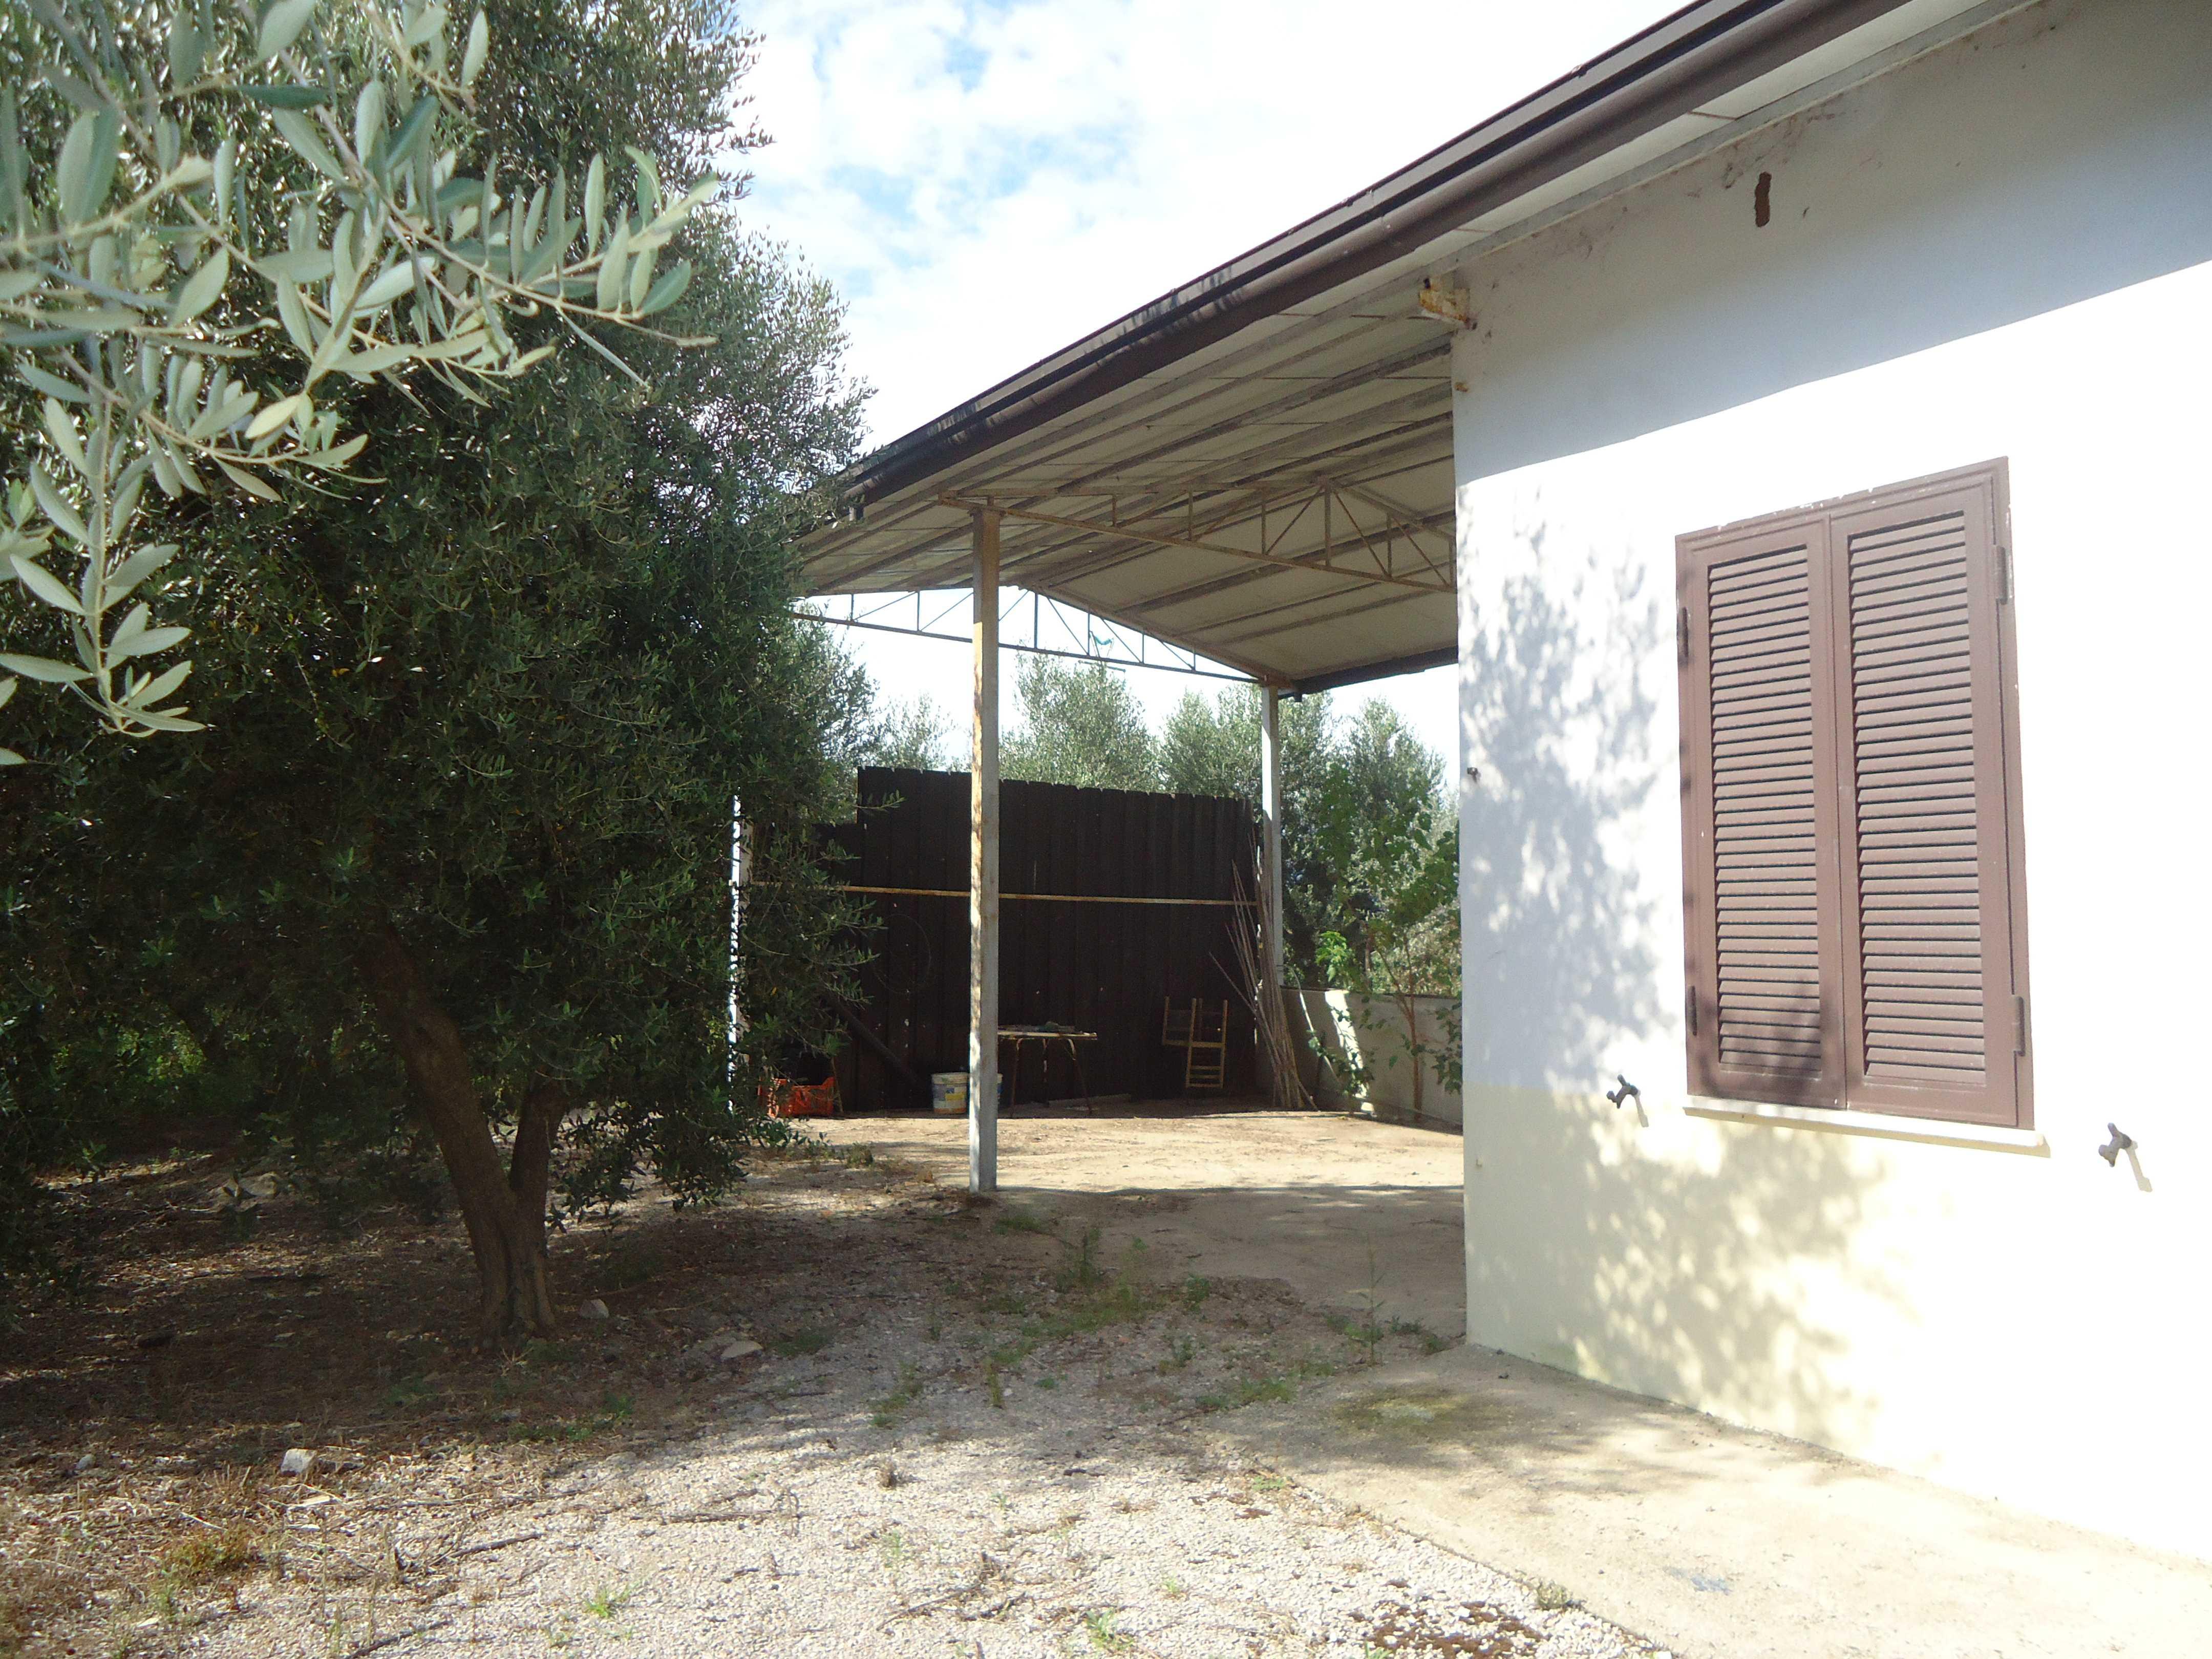 Vendita rustico casale terracina latina italia via for Case in vendita terracina